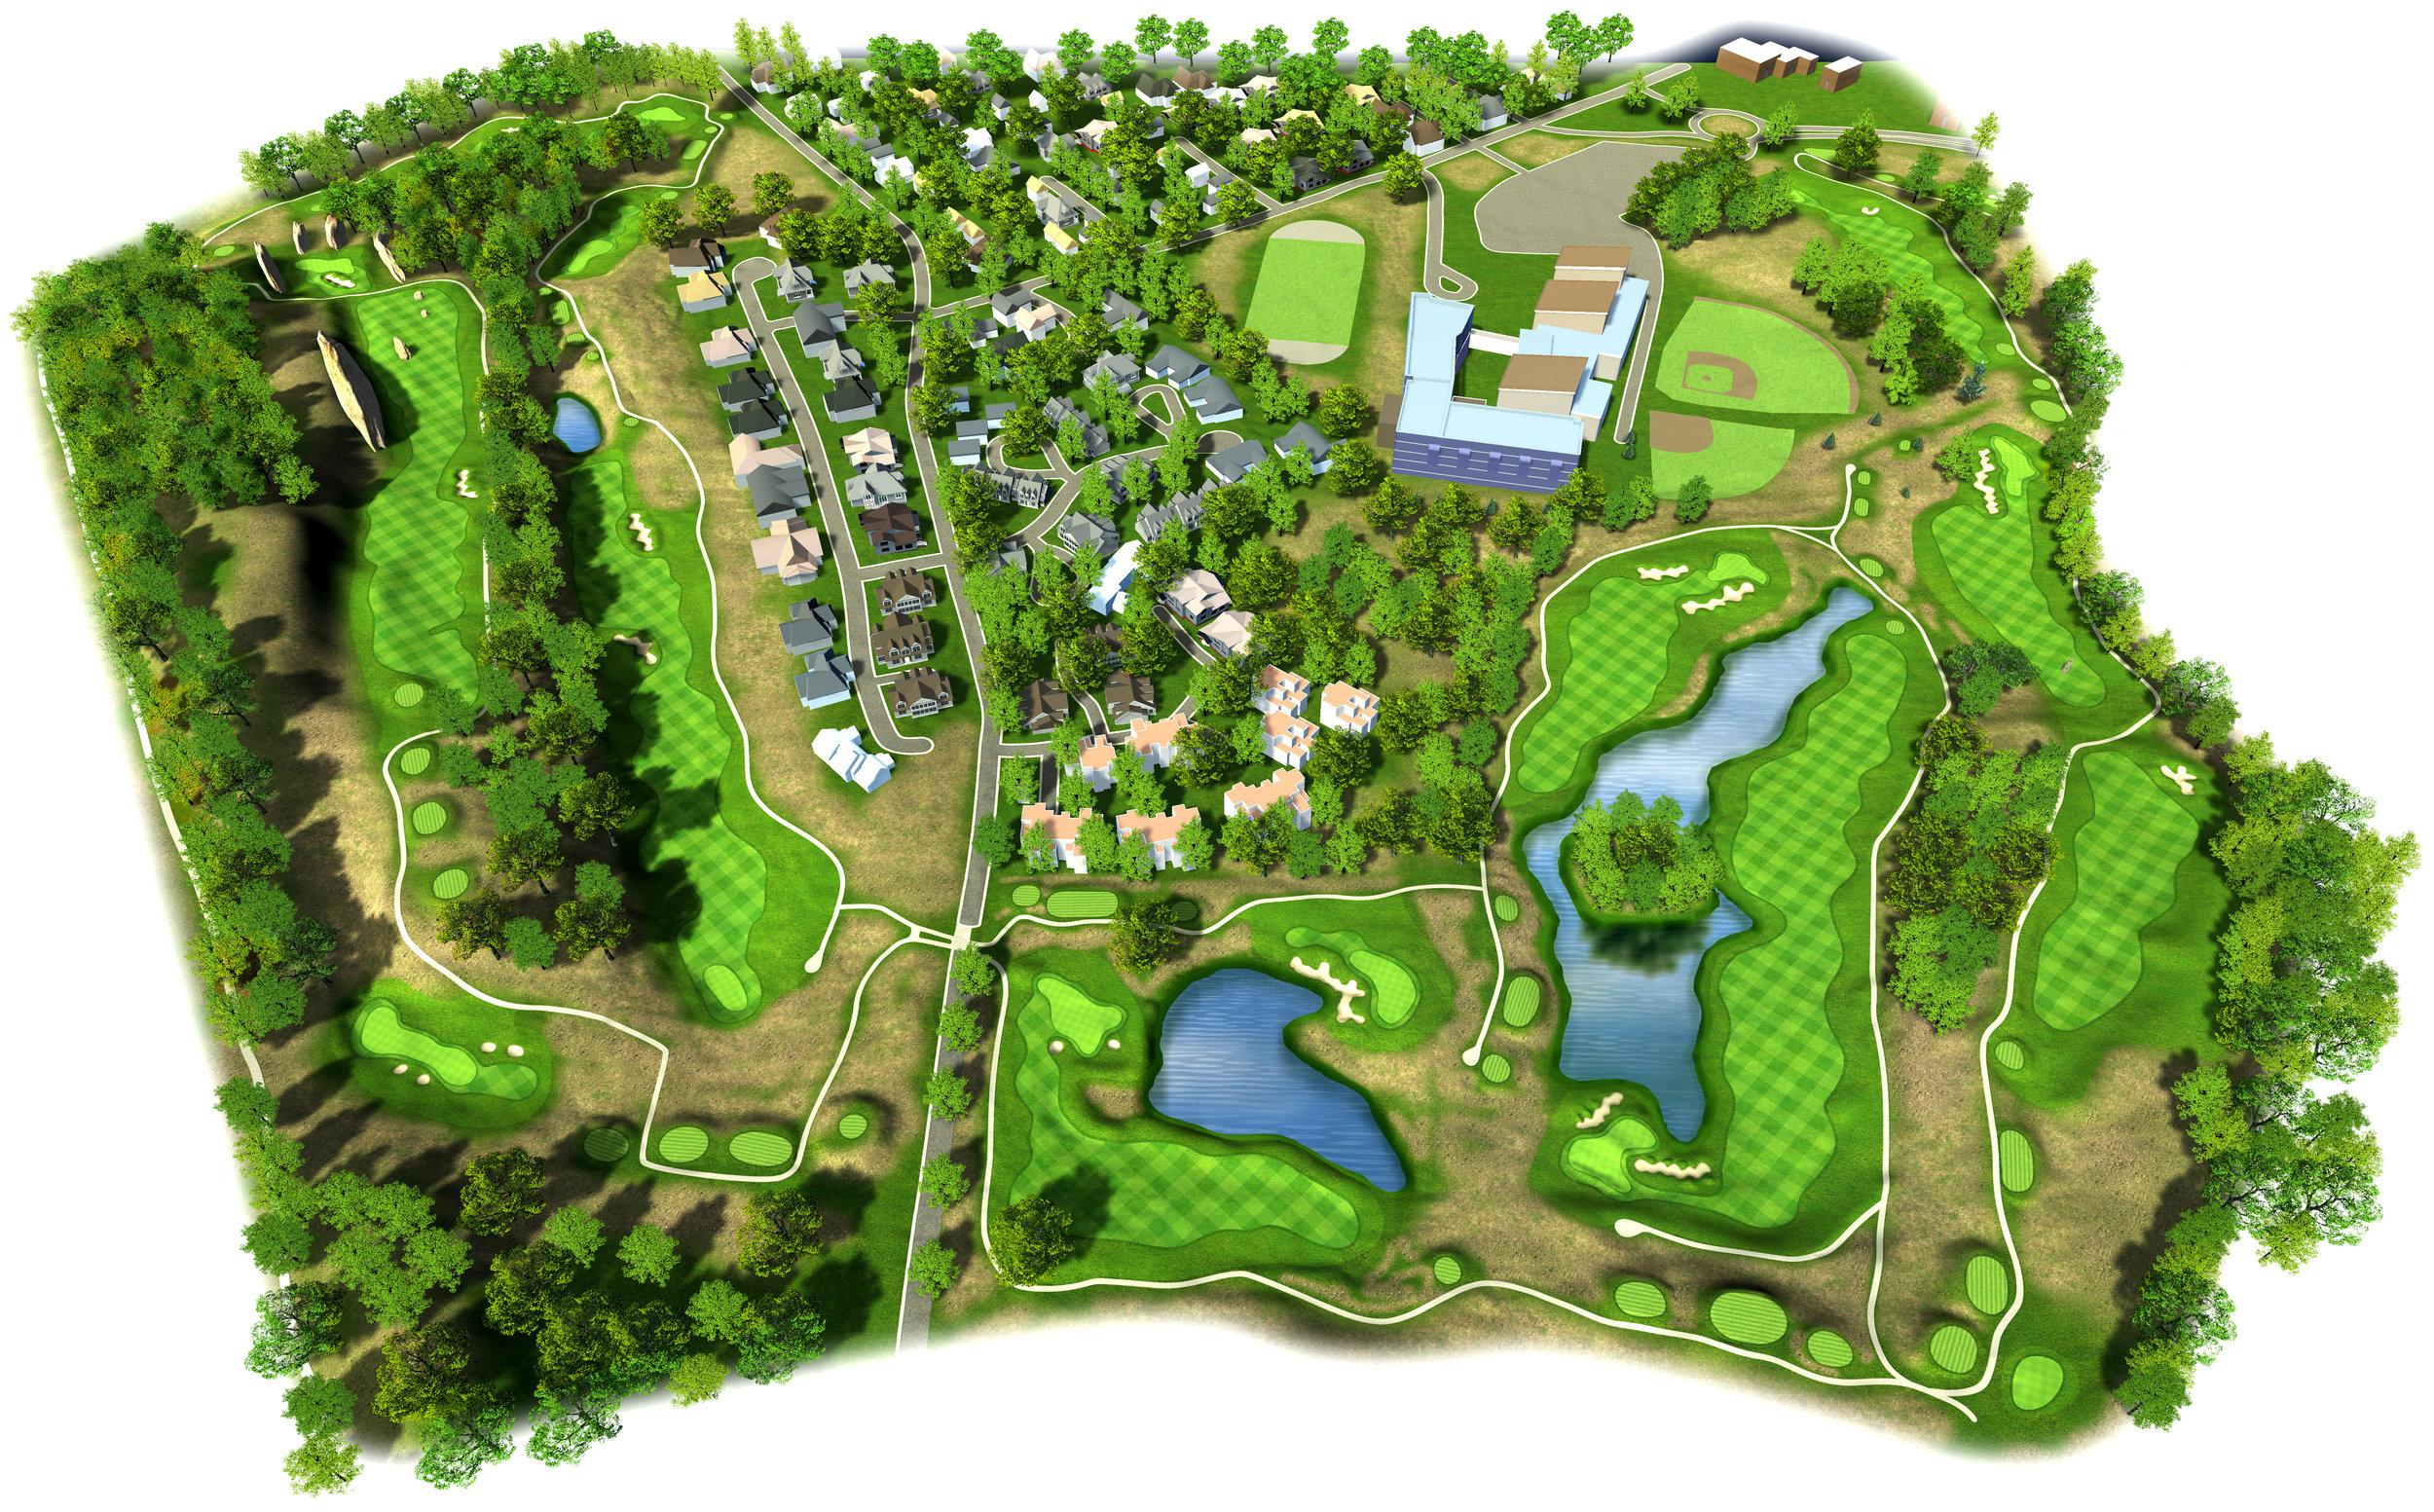 3d Golf Course Renderings Visualization Panoram Cgi